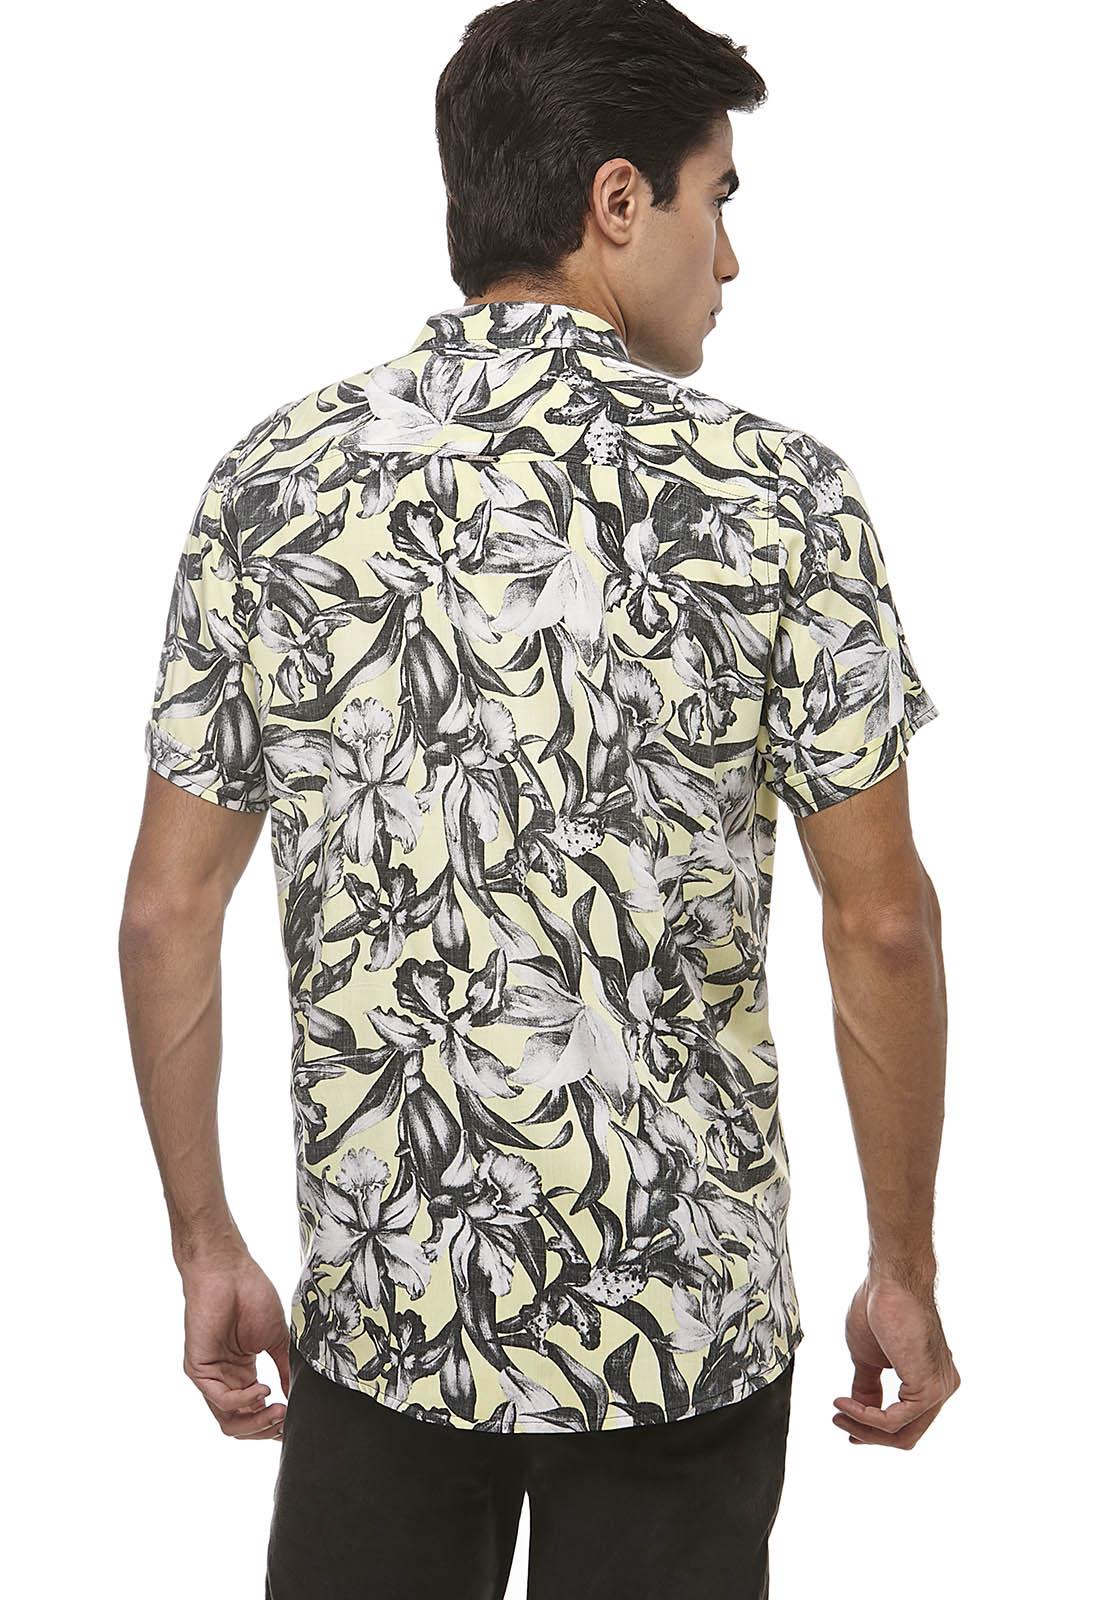 Camisa Zaiko Slim Estampada Manga Curta 1860 Amarelo